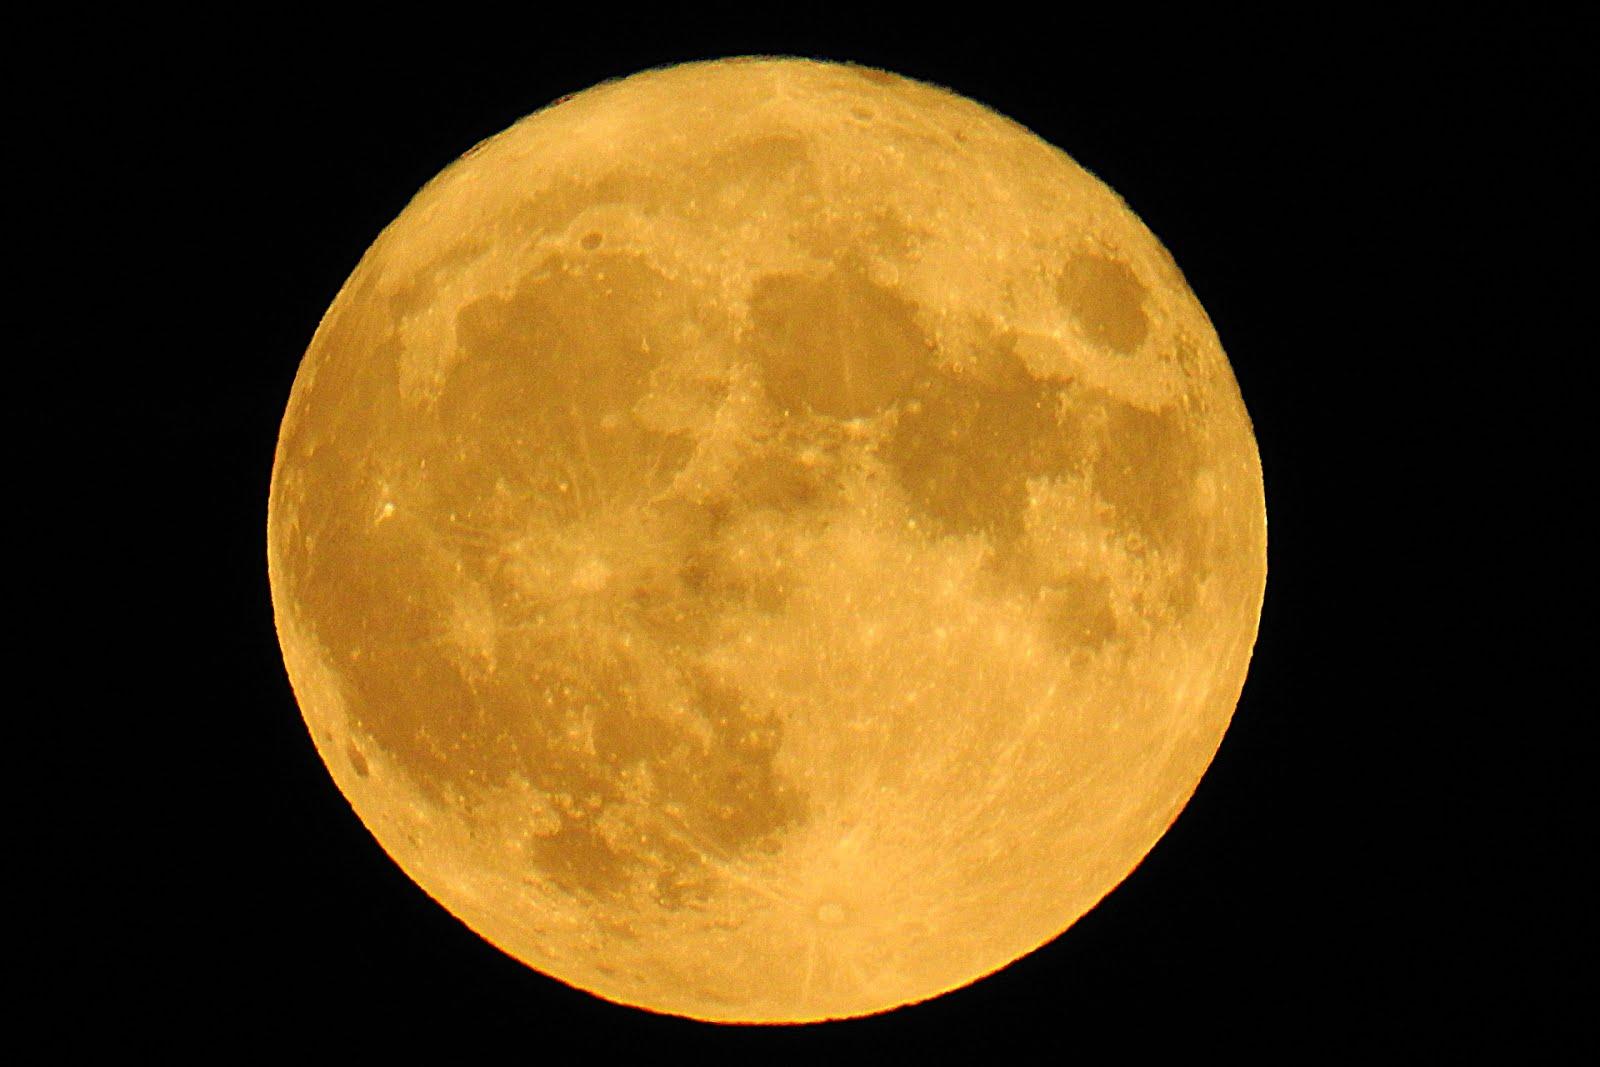 blood moon 2019 okc - photo #45